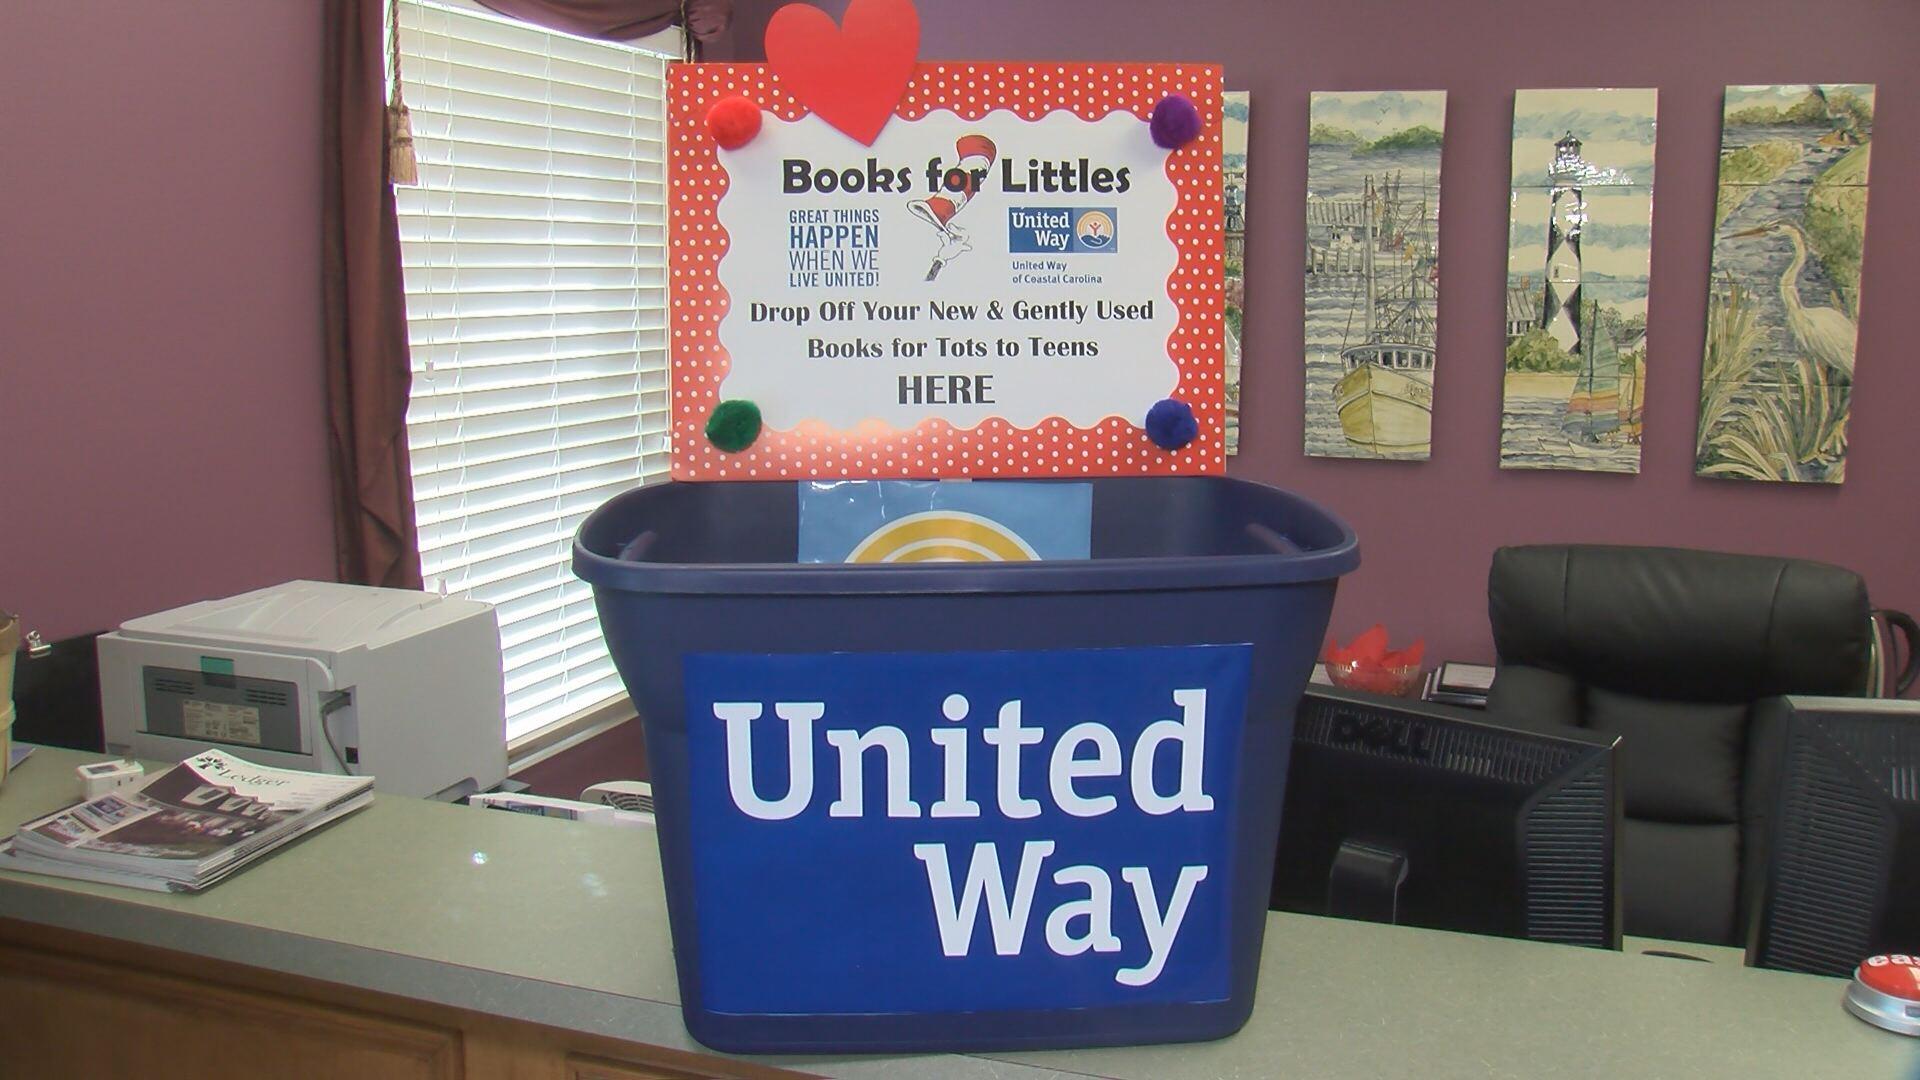 BOOKS FOR LITTLES DRIVE_564740